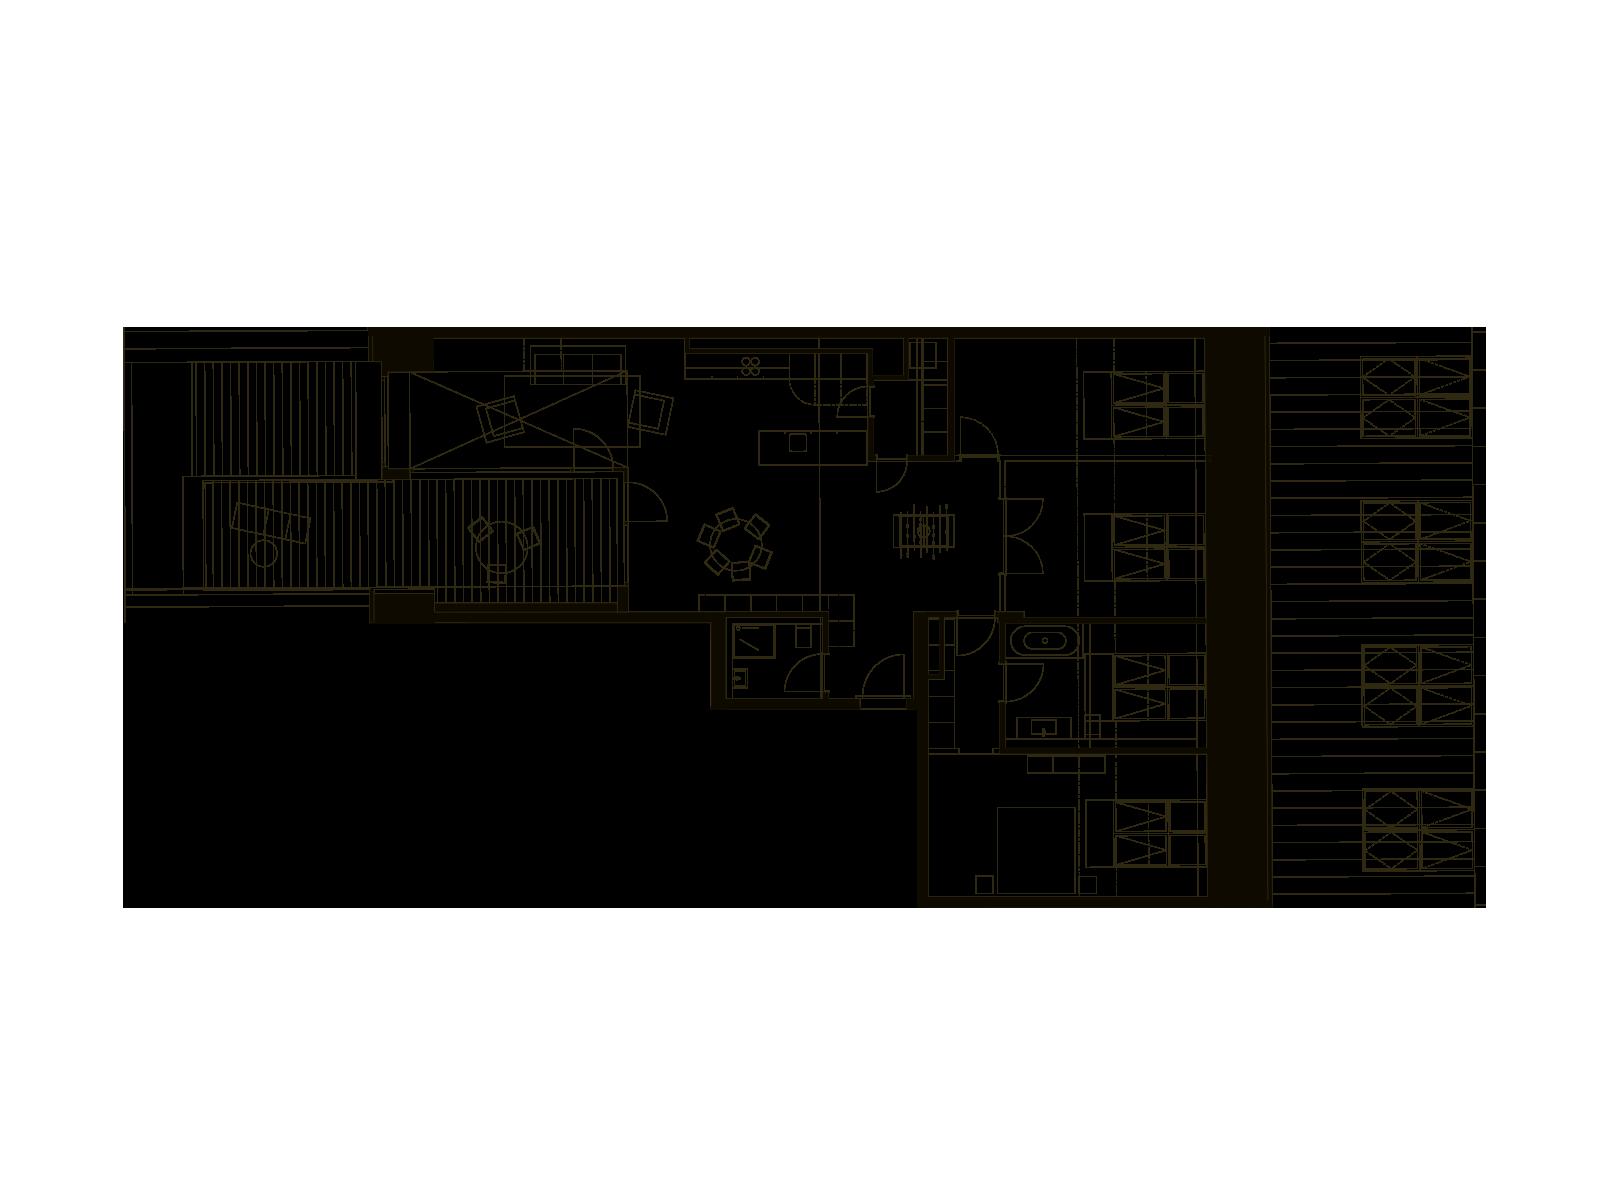 E.5.03